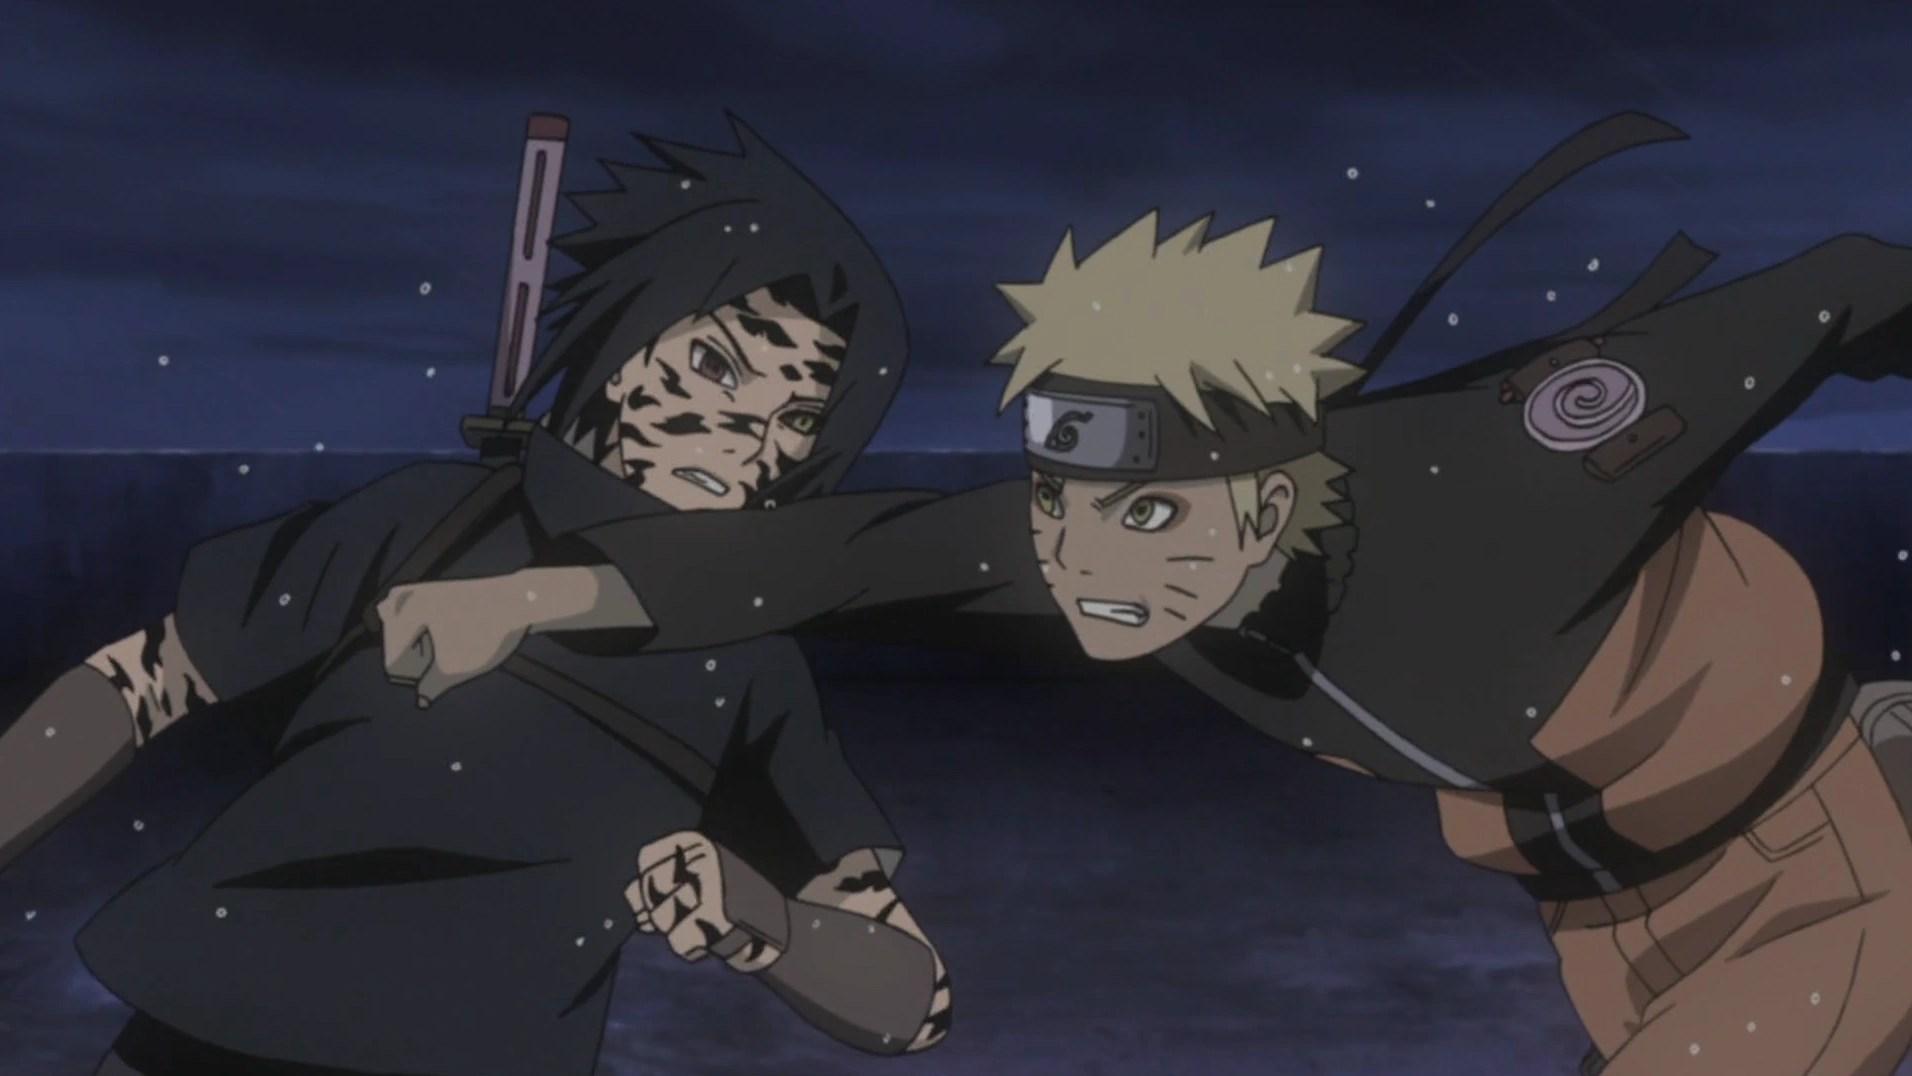 Collision Narutopedia Fandom powered by Wikia